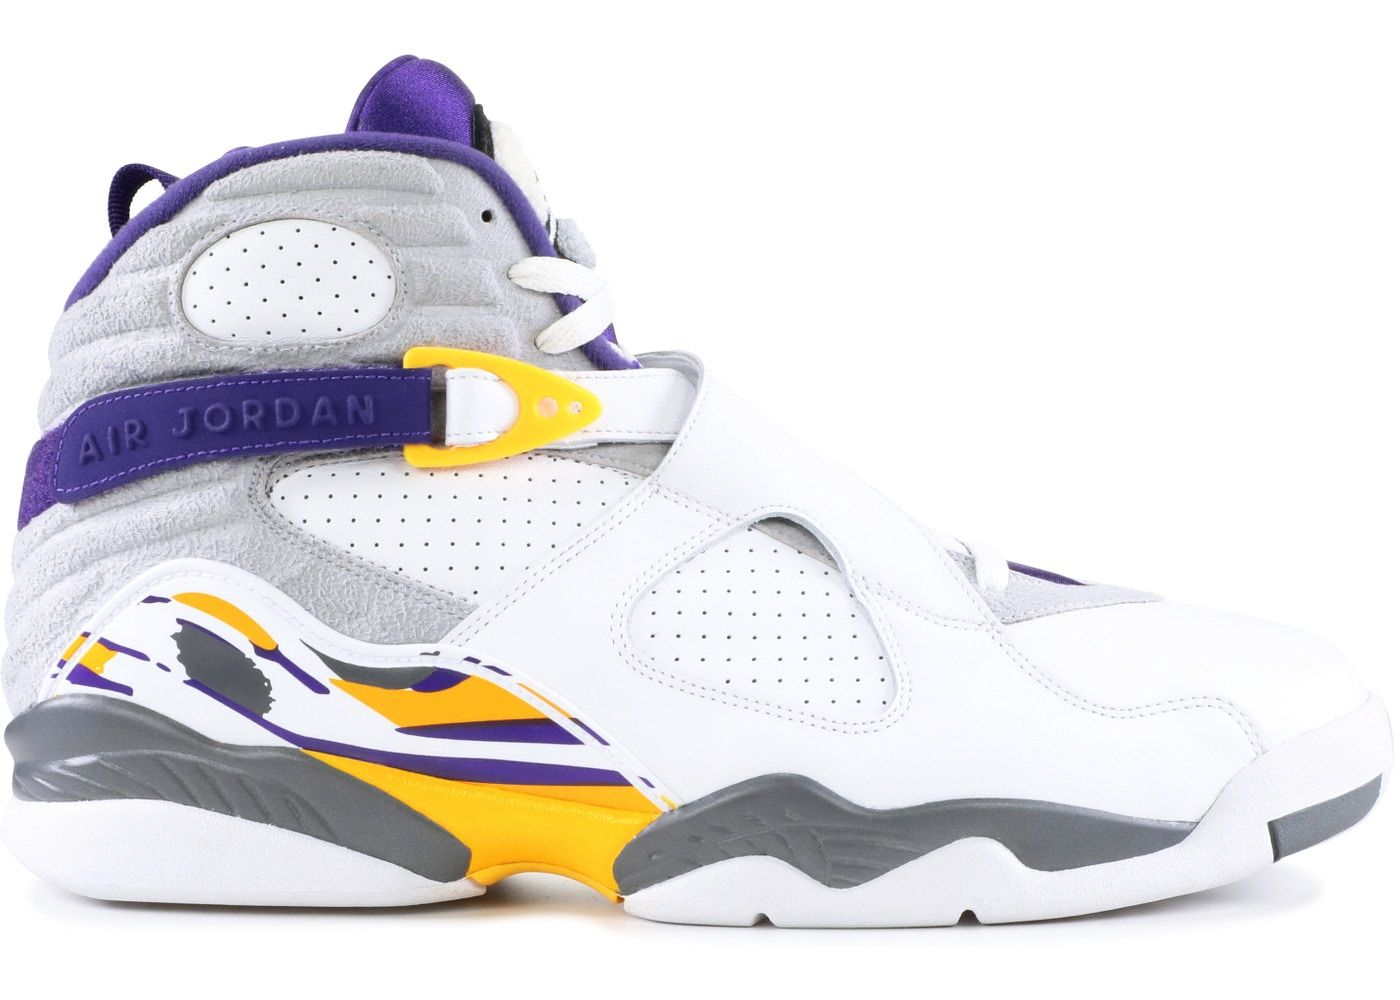 Kobe Pe Jordan Pack A Definite Holy Grail For A Laker Kobe Fan Kobe Bryant Shoes Kobe Bryant Sneakers Kobe Bryant